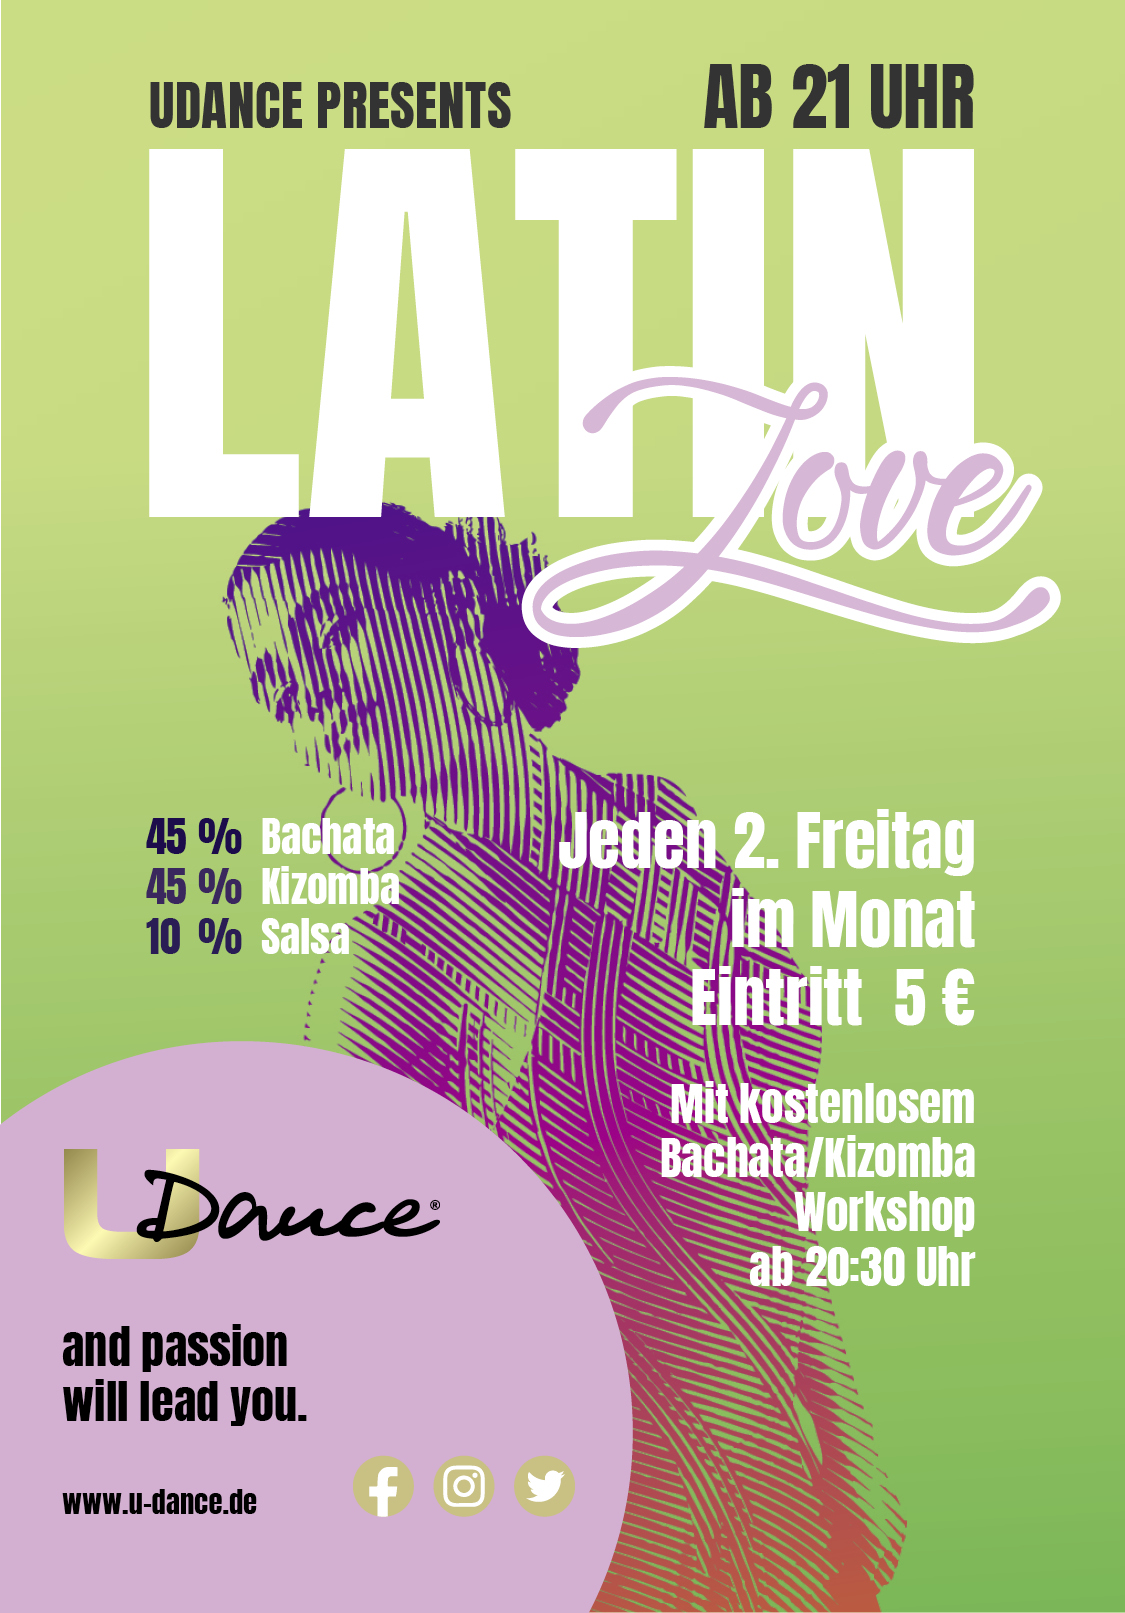 Latin Love Party mit Bachata, Kizomba und Salsa